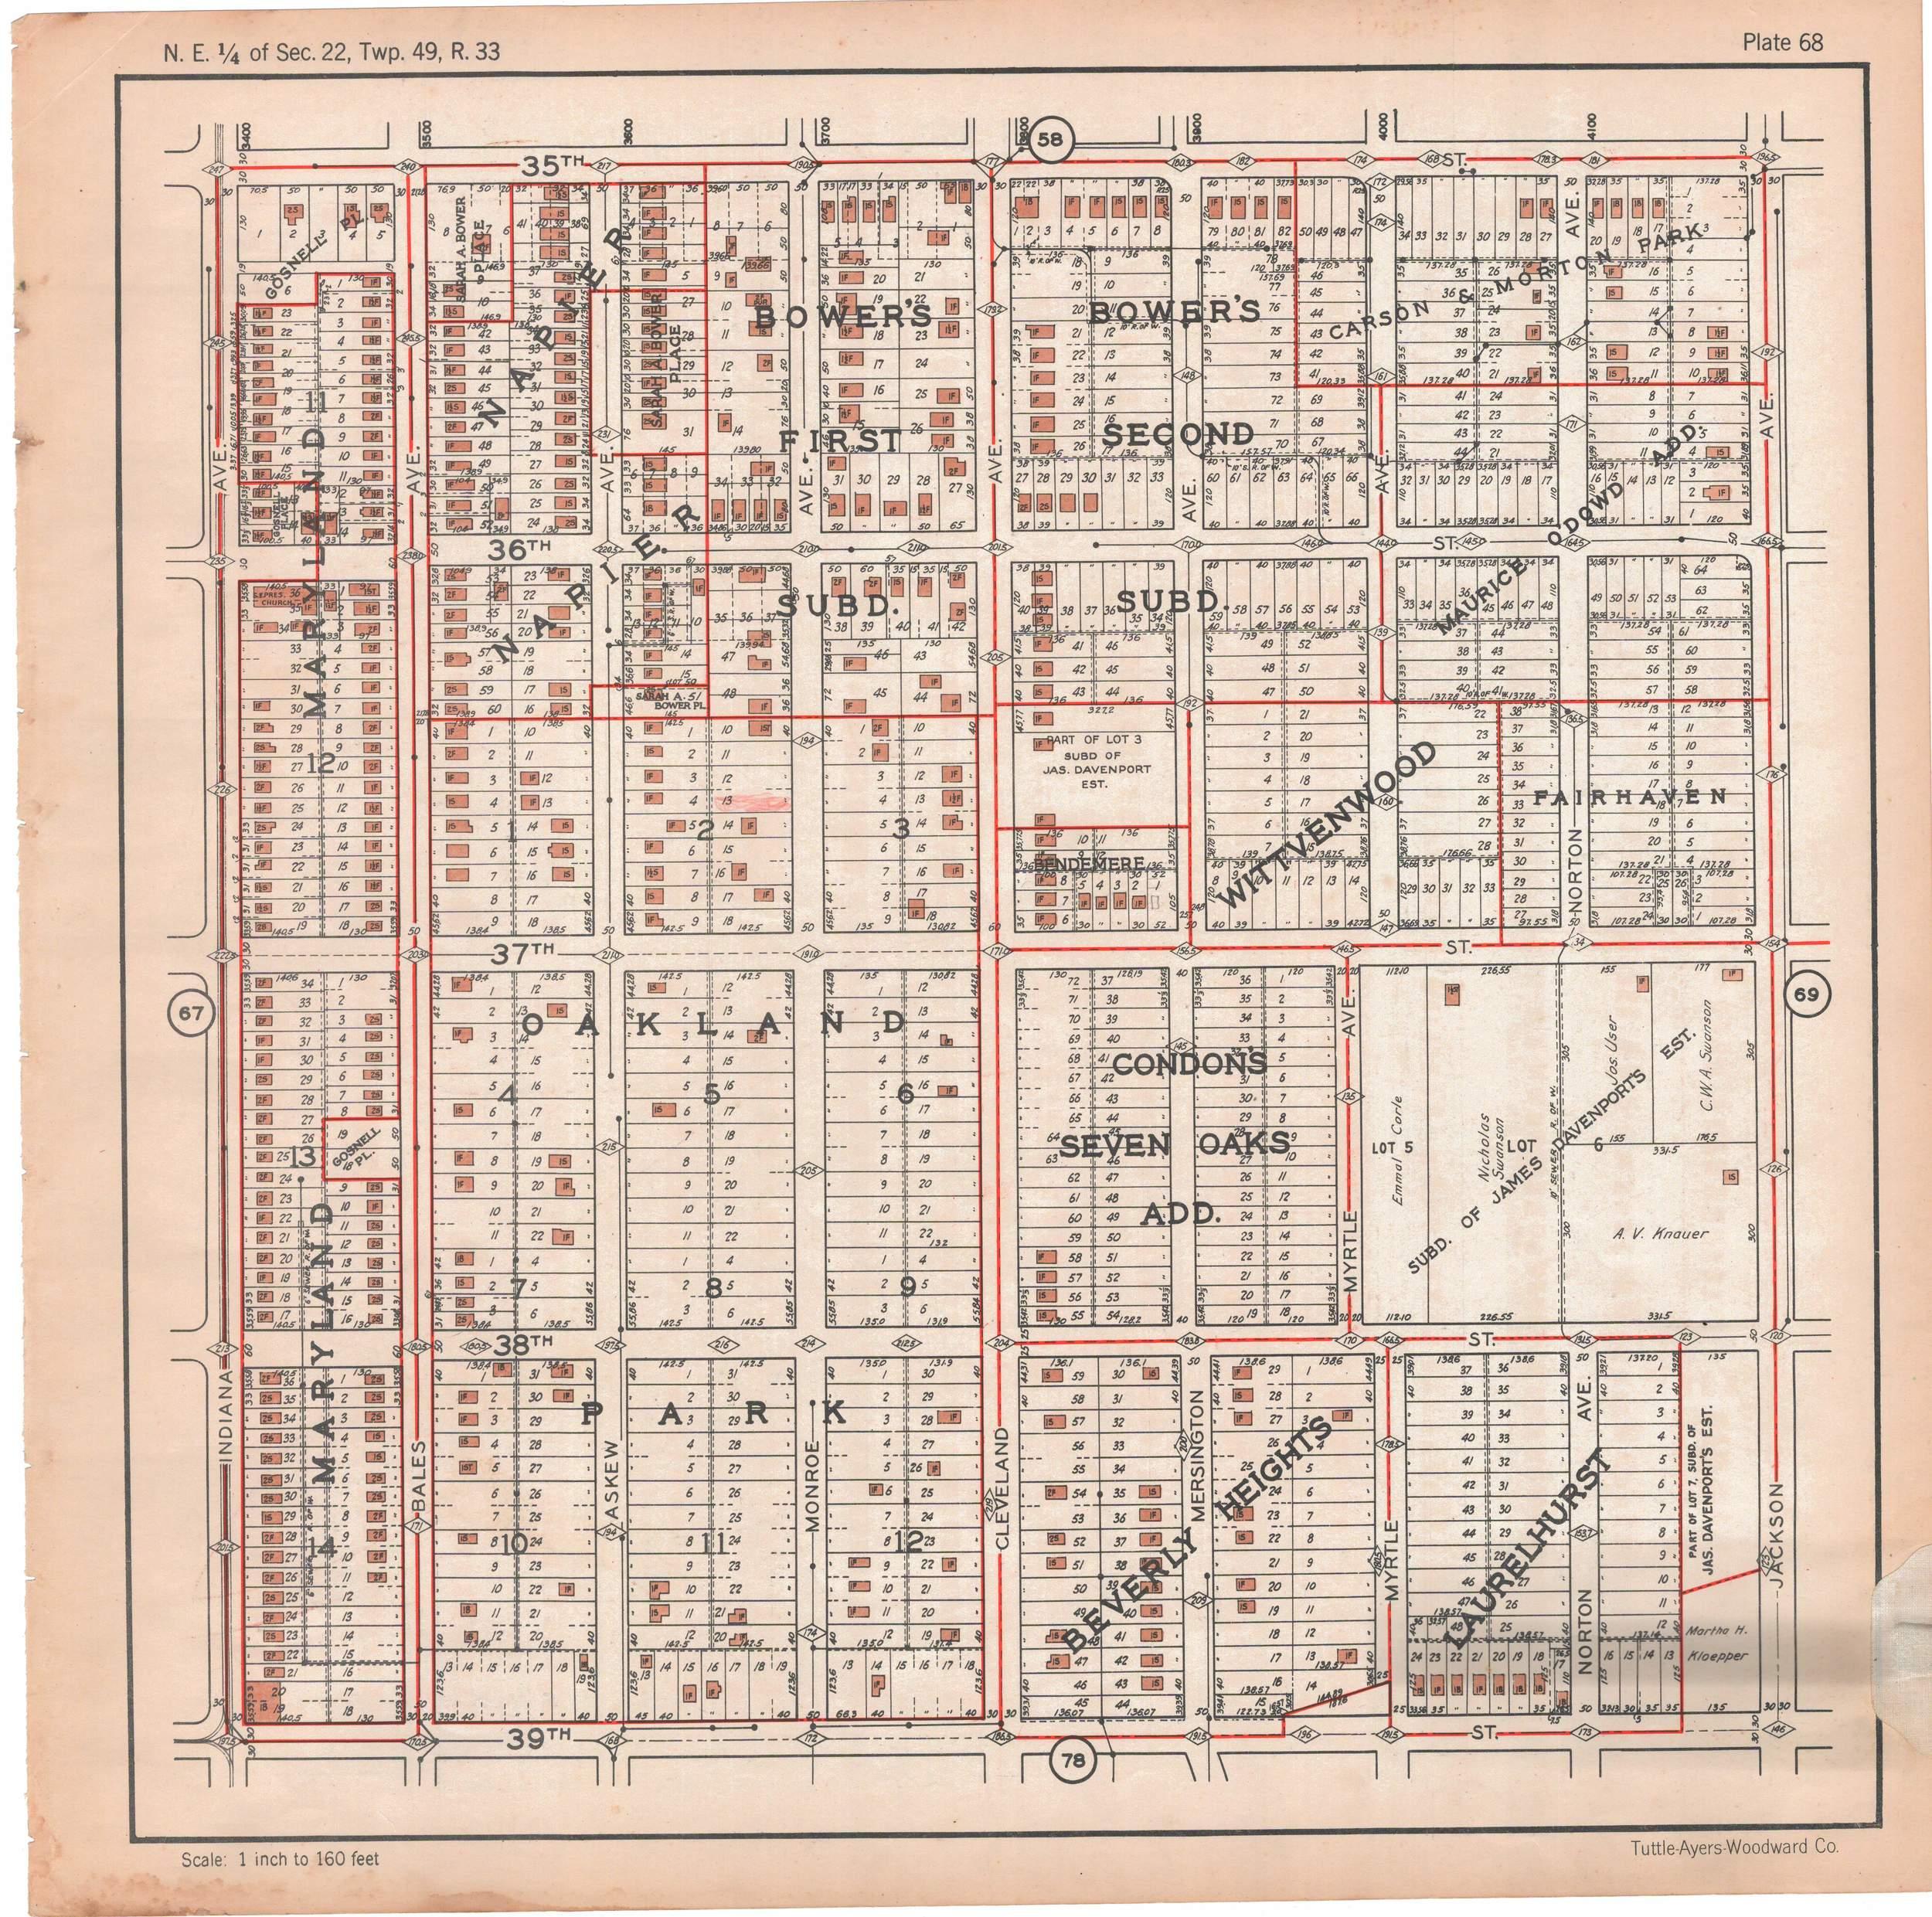 1925 TUTTLE_AYERS_Plate 68.JPG